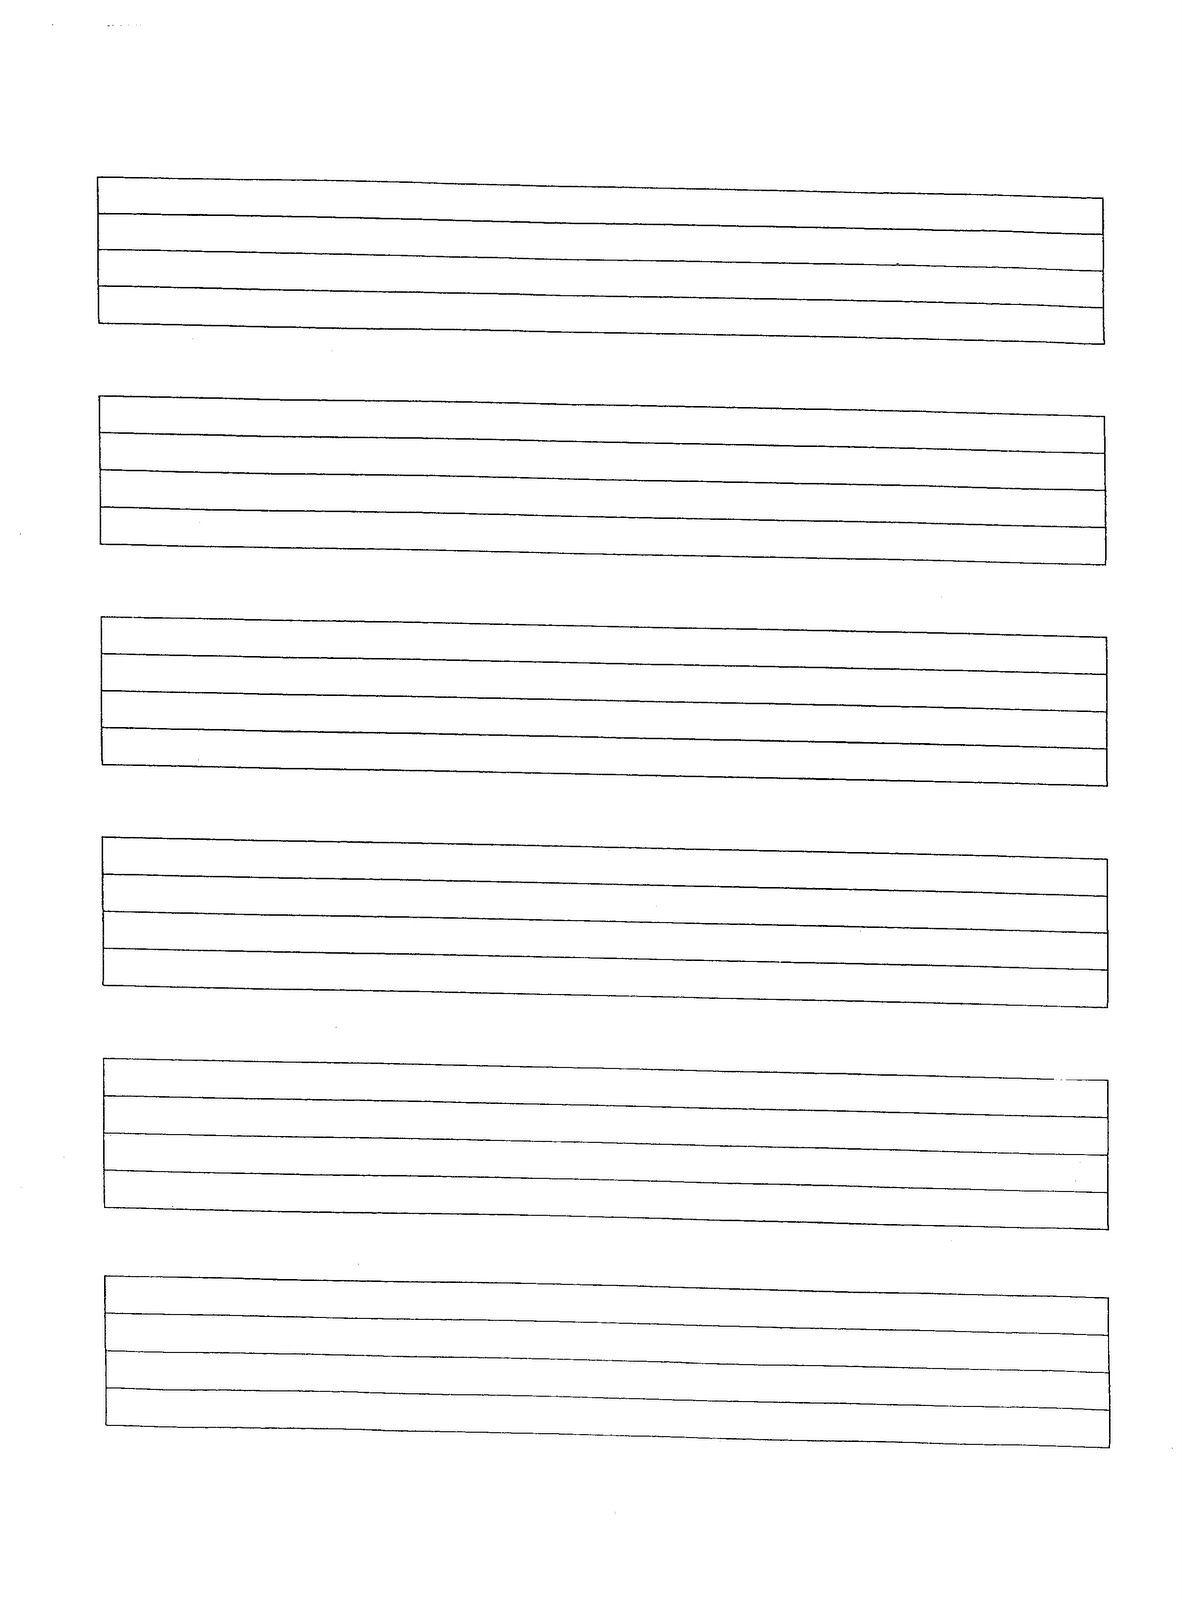 blank treble clef staff paper pdf unique treble clef sheets teaching